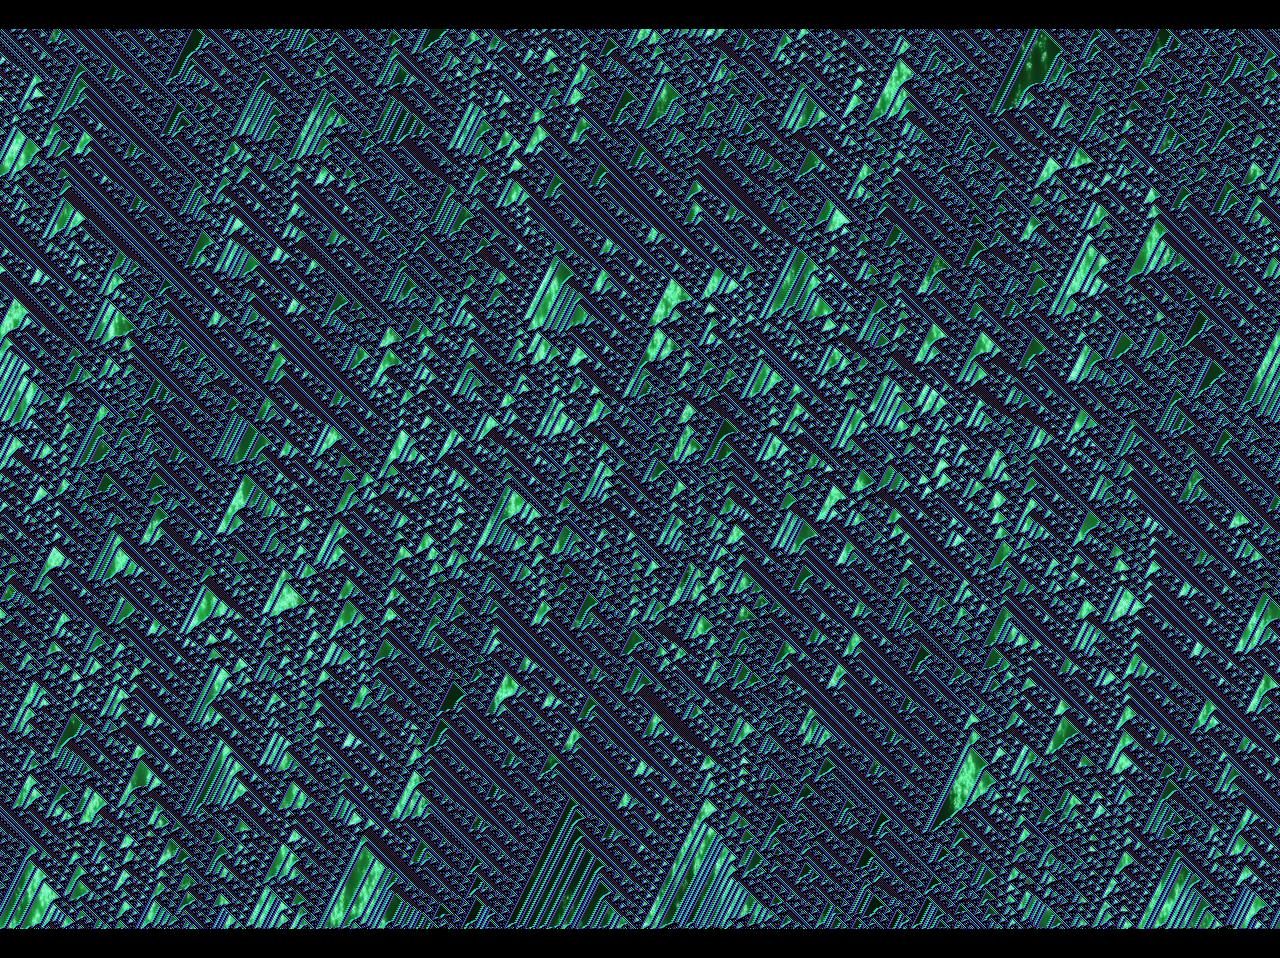 Next Nearest Neighbors Cellular Automata The QL Files 1280x958